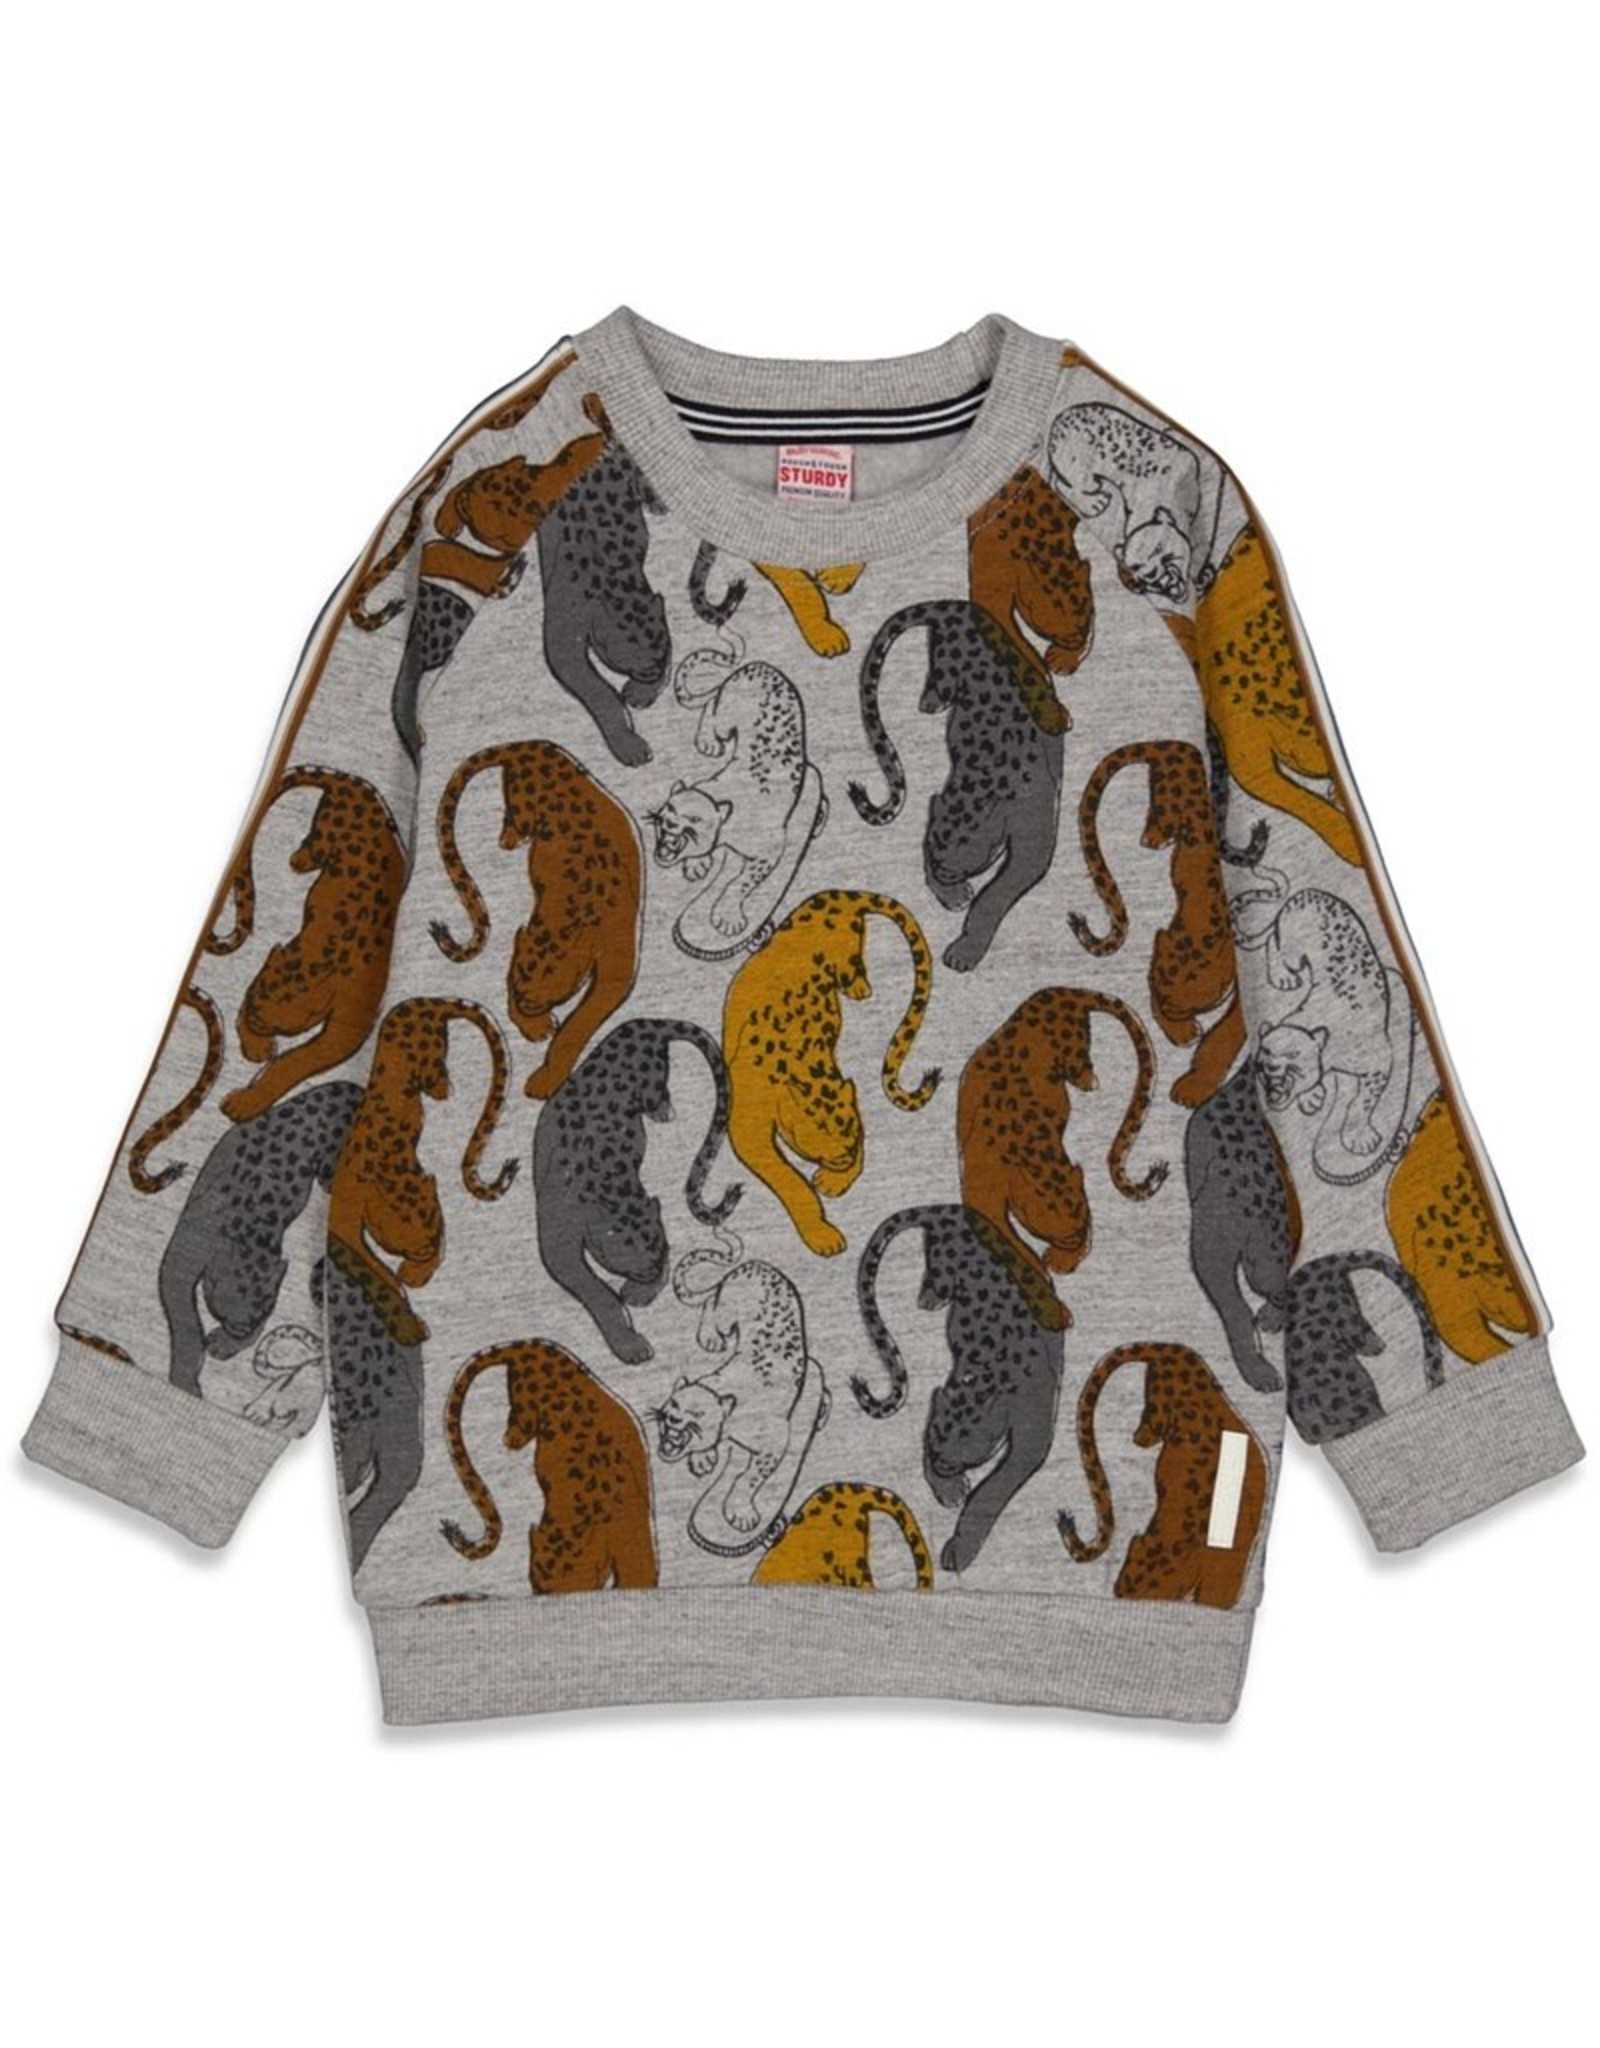 Sturdy 71600443 Sweater